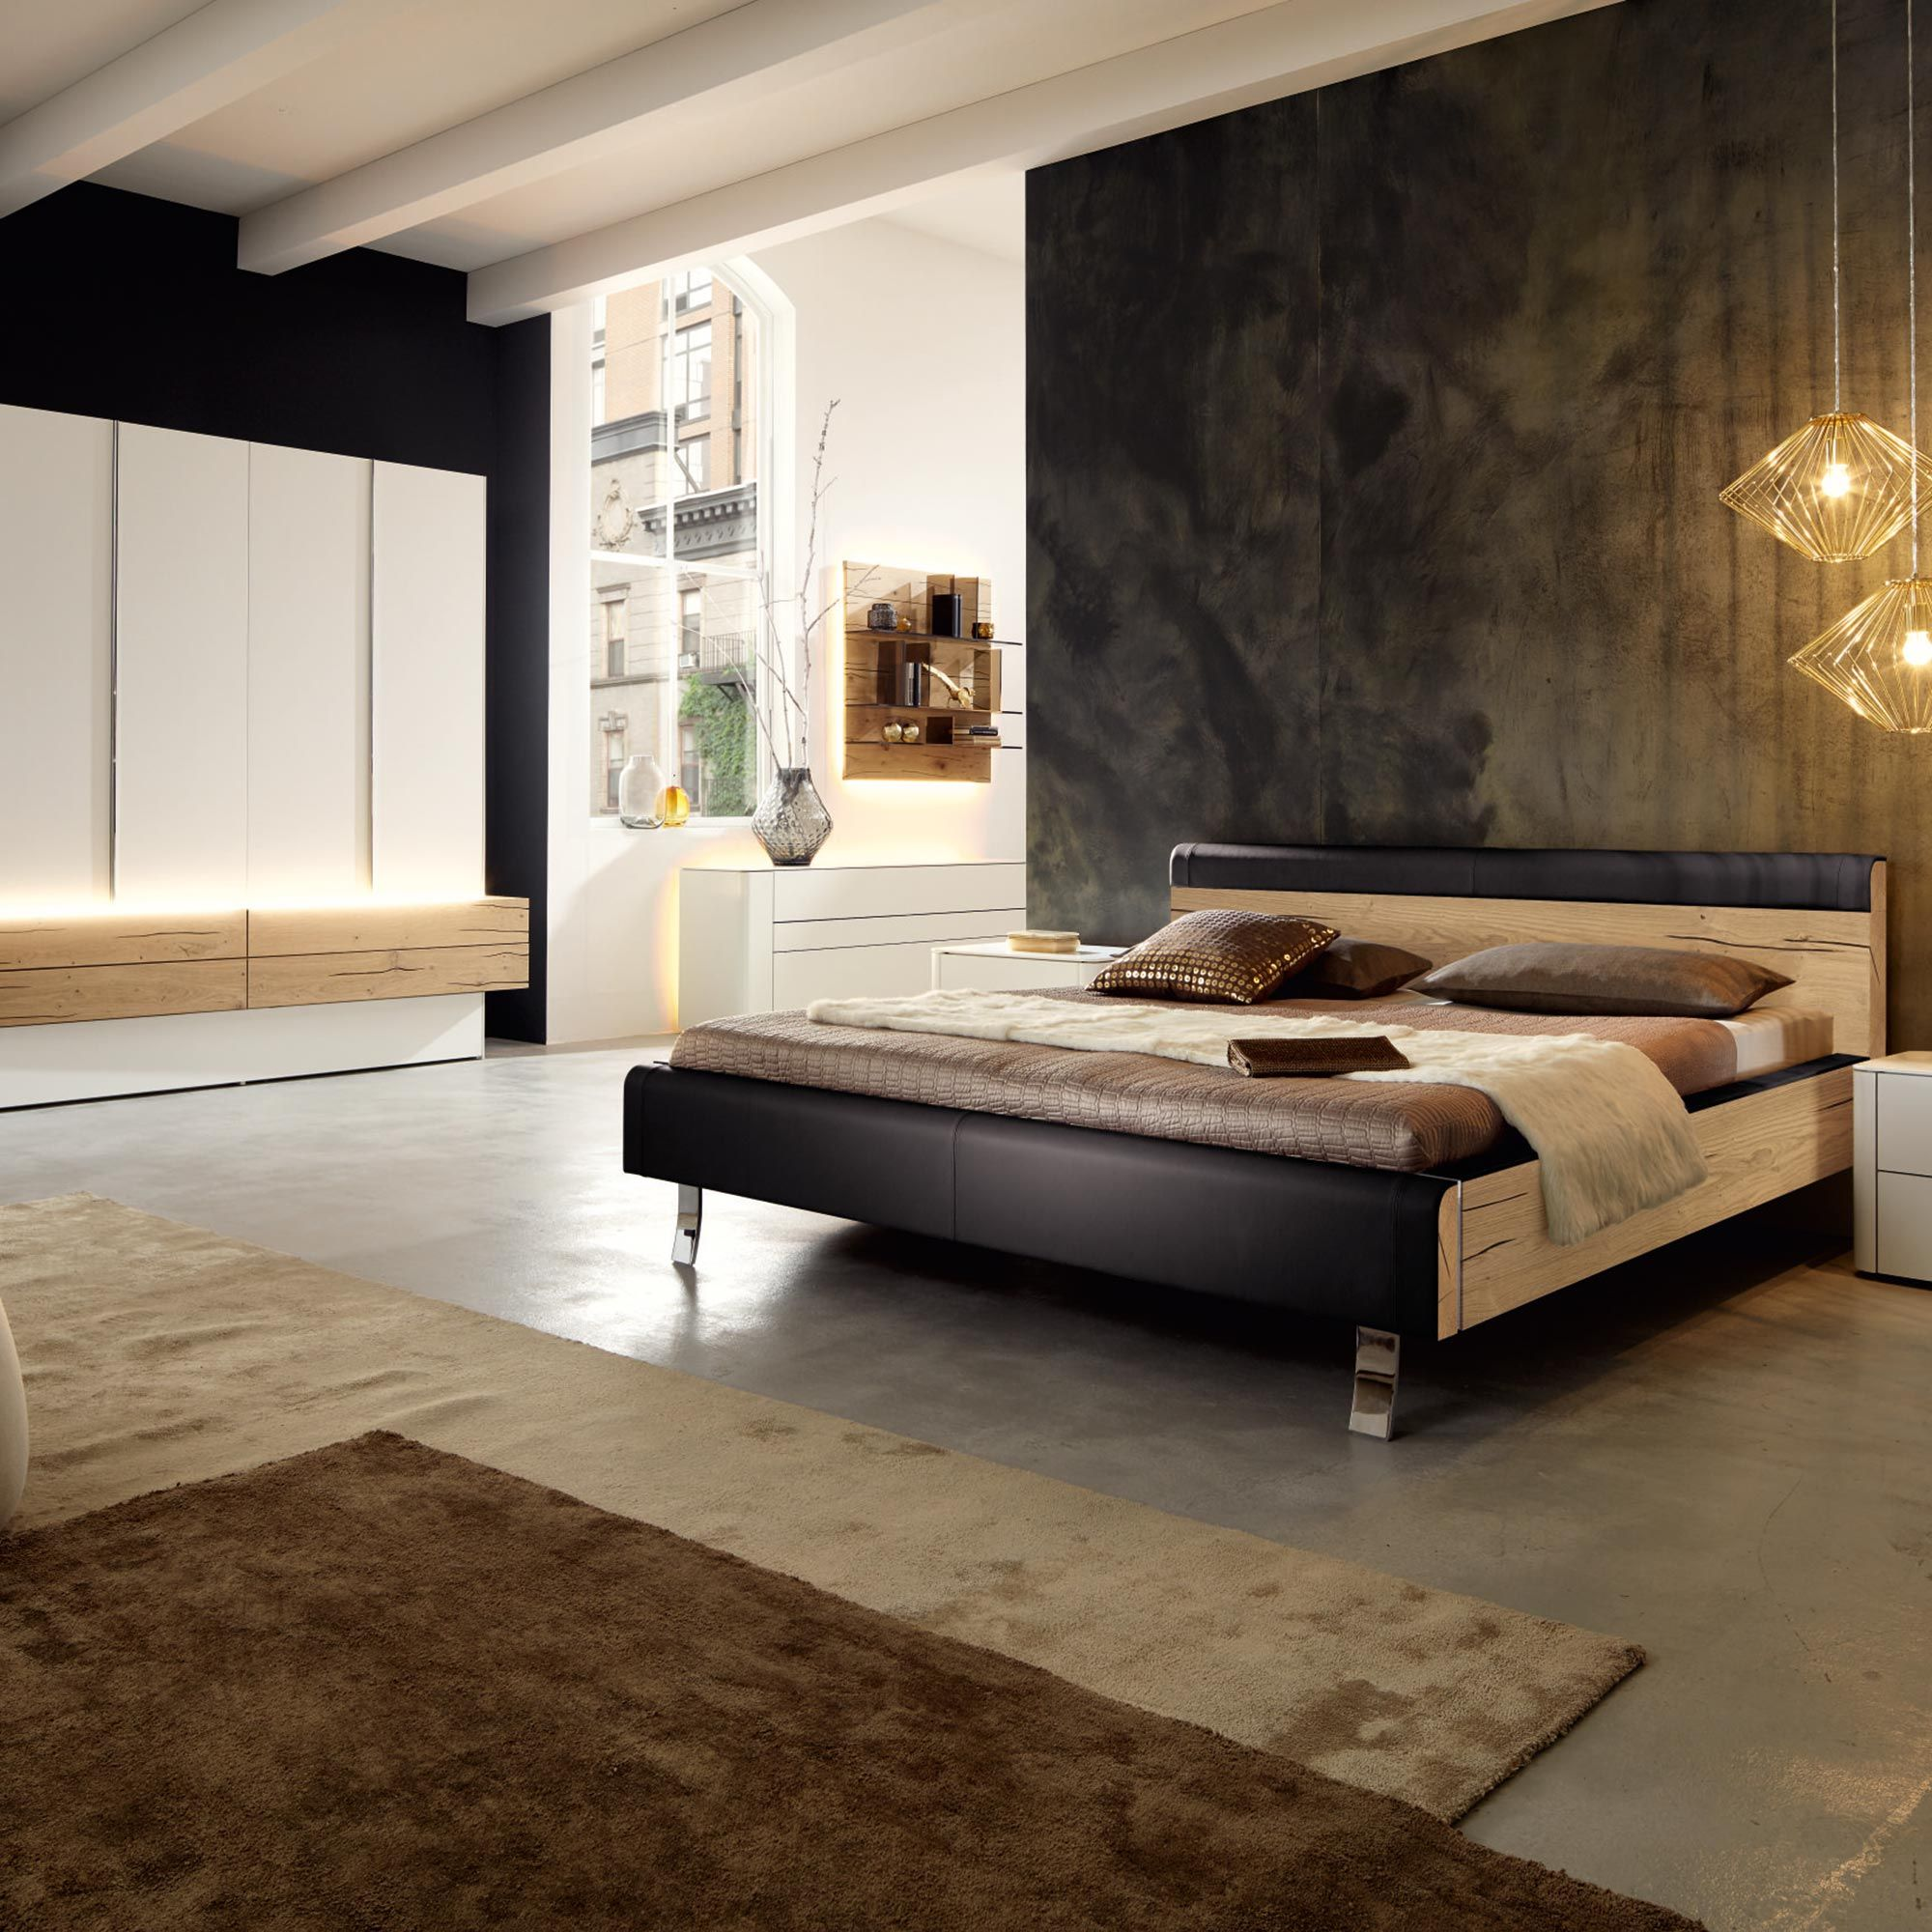 hülsta schlafzimmer metis hülsta schlafzimmer komplett hülsta ...